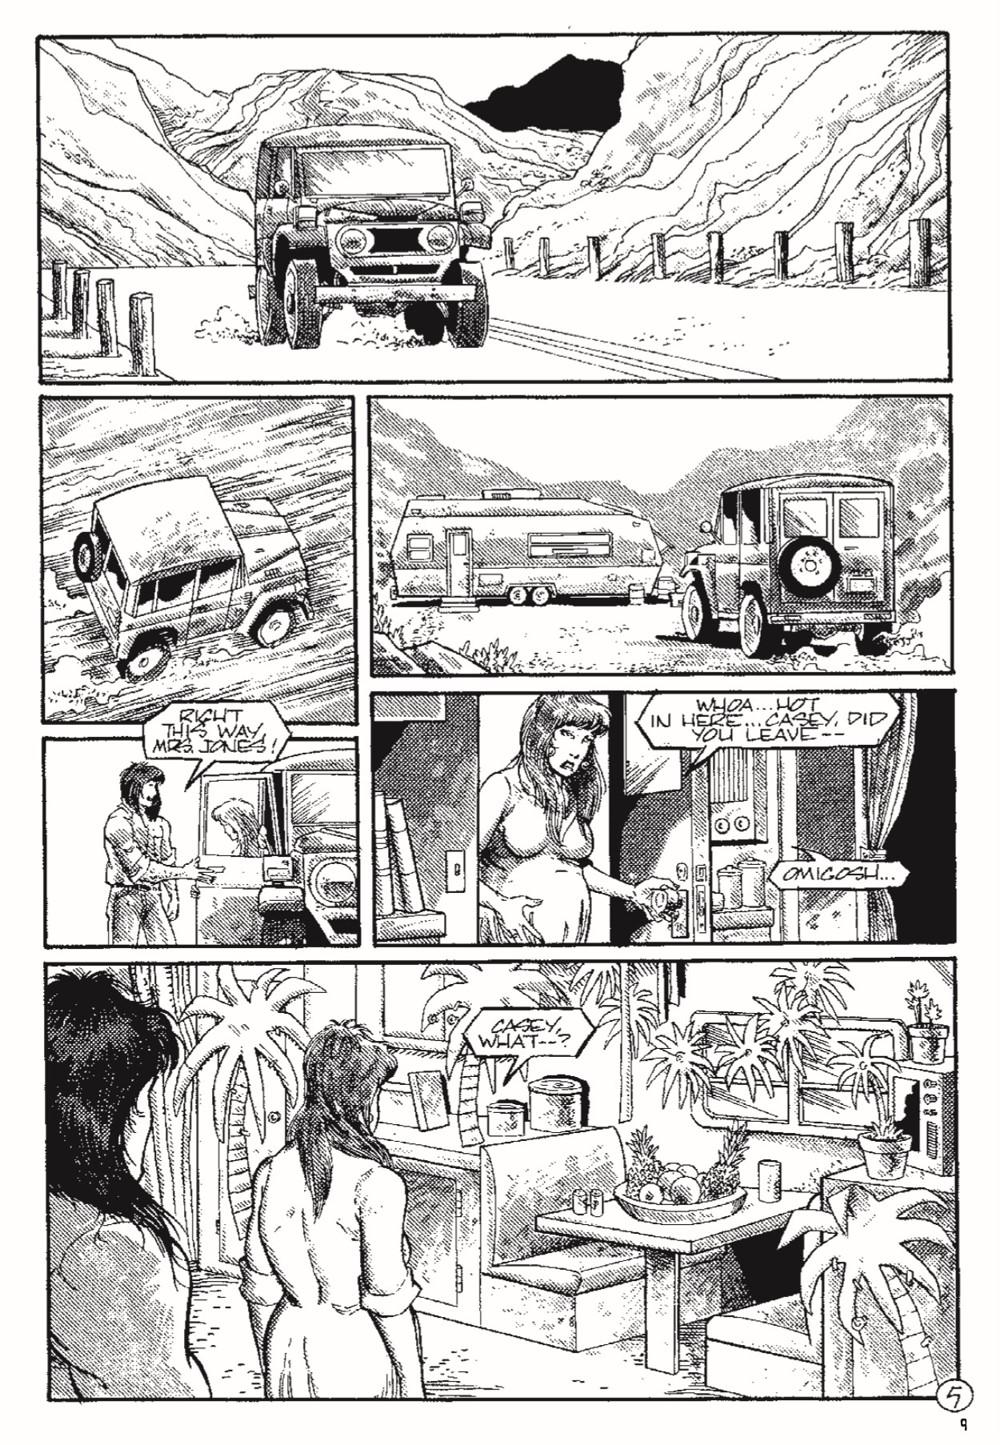 TMNTUltimate_V5_TPB_pr-7 ComicList Previews: TEENAGE MUTANT NINJA TURTLES THE ULTIMATE COLLECTION VOLUME 5 TP